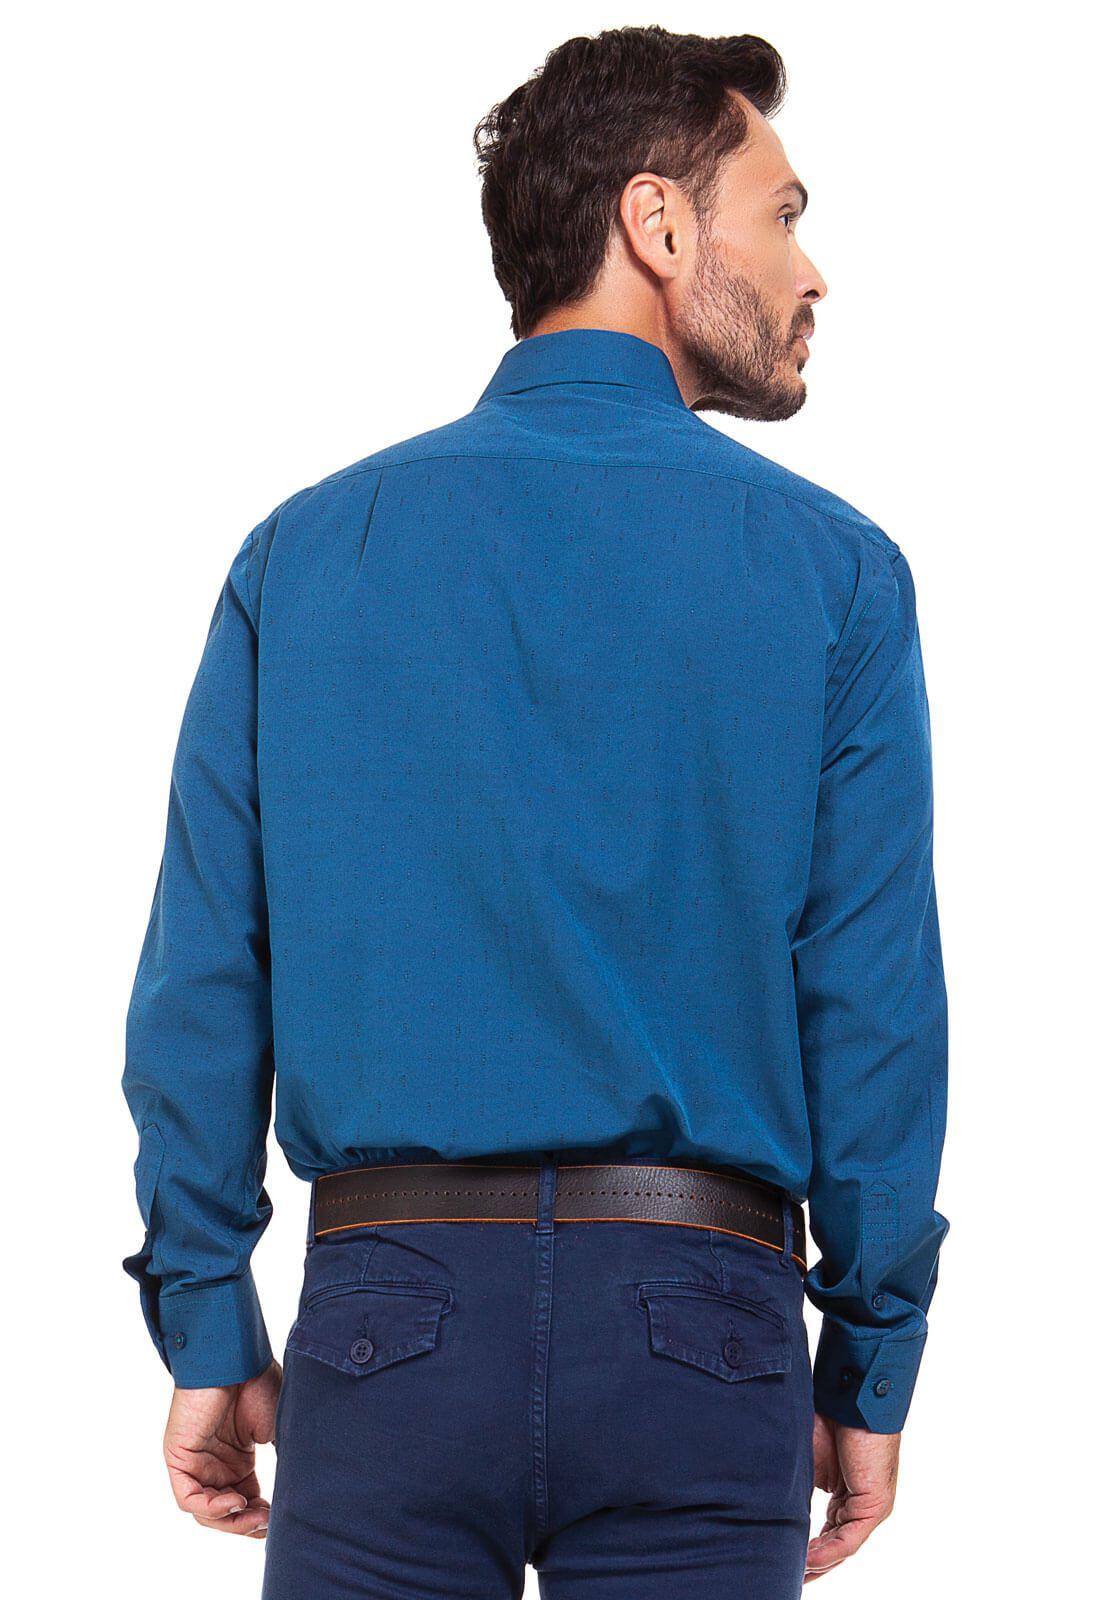 Camisa Social Masculina Olimpo Maquinetada Manga Longa Azul